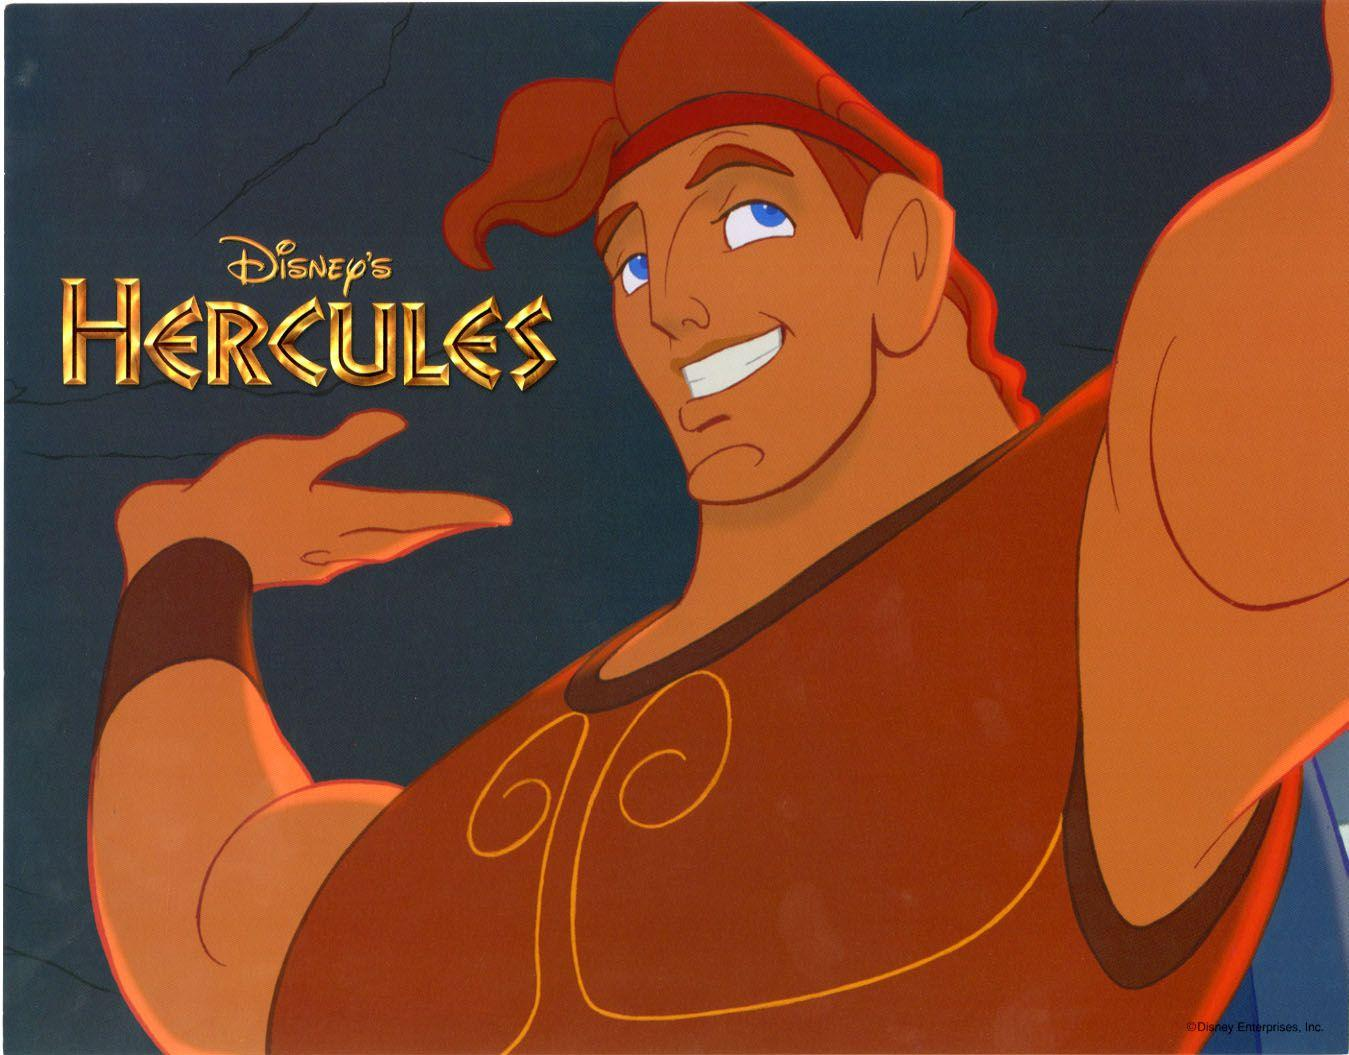 Disney Hercules Movie HD Wallpaper Image for PC - Cartoons Wallpapers